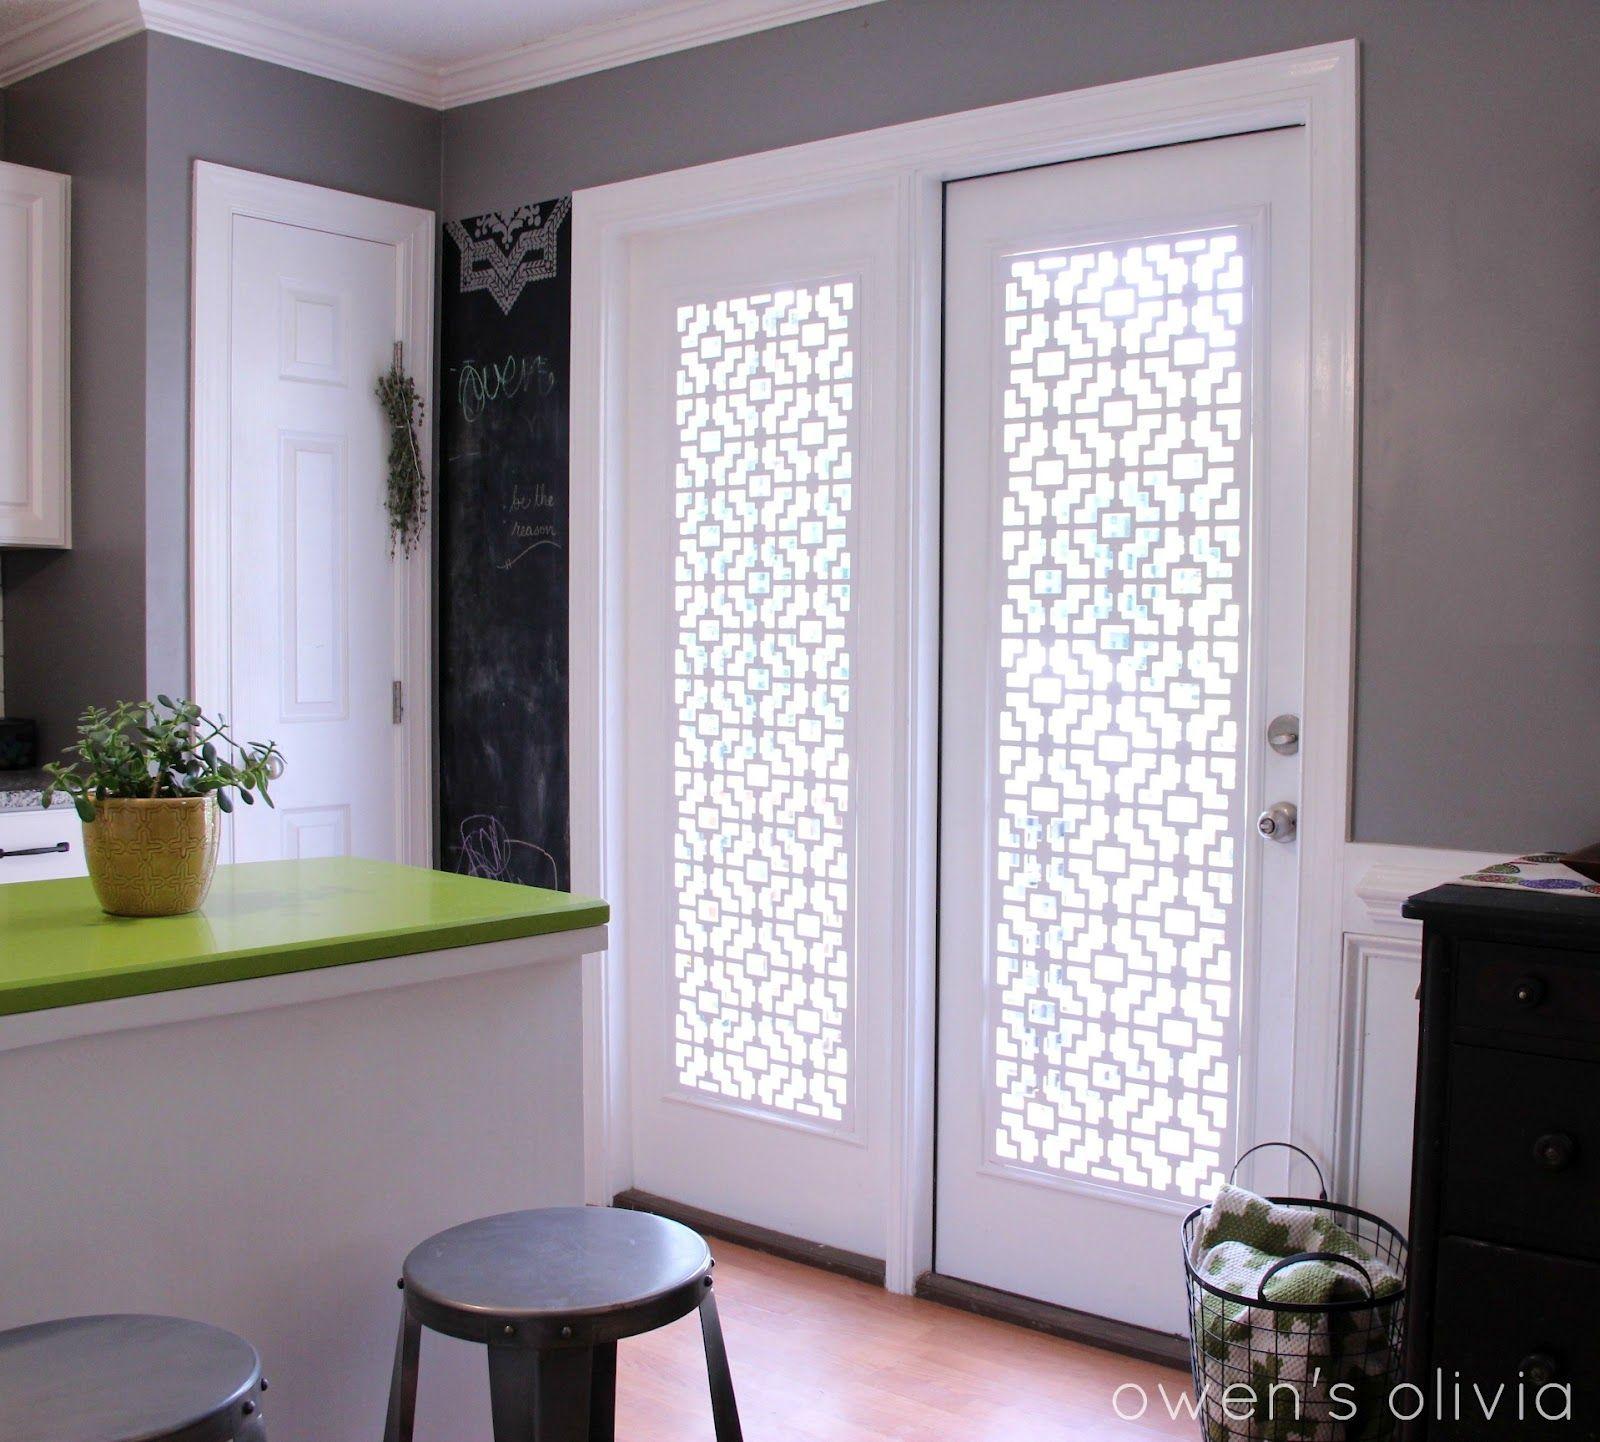 Owen s olivia custom window treatments using pvc i 3 this for my kitchen